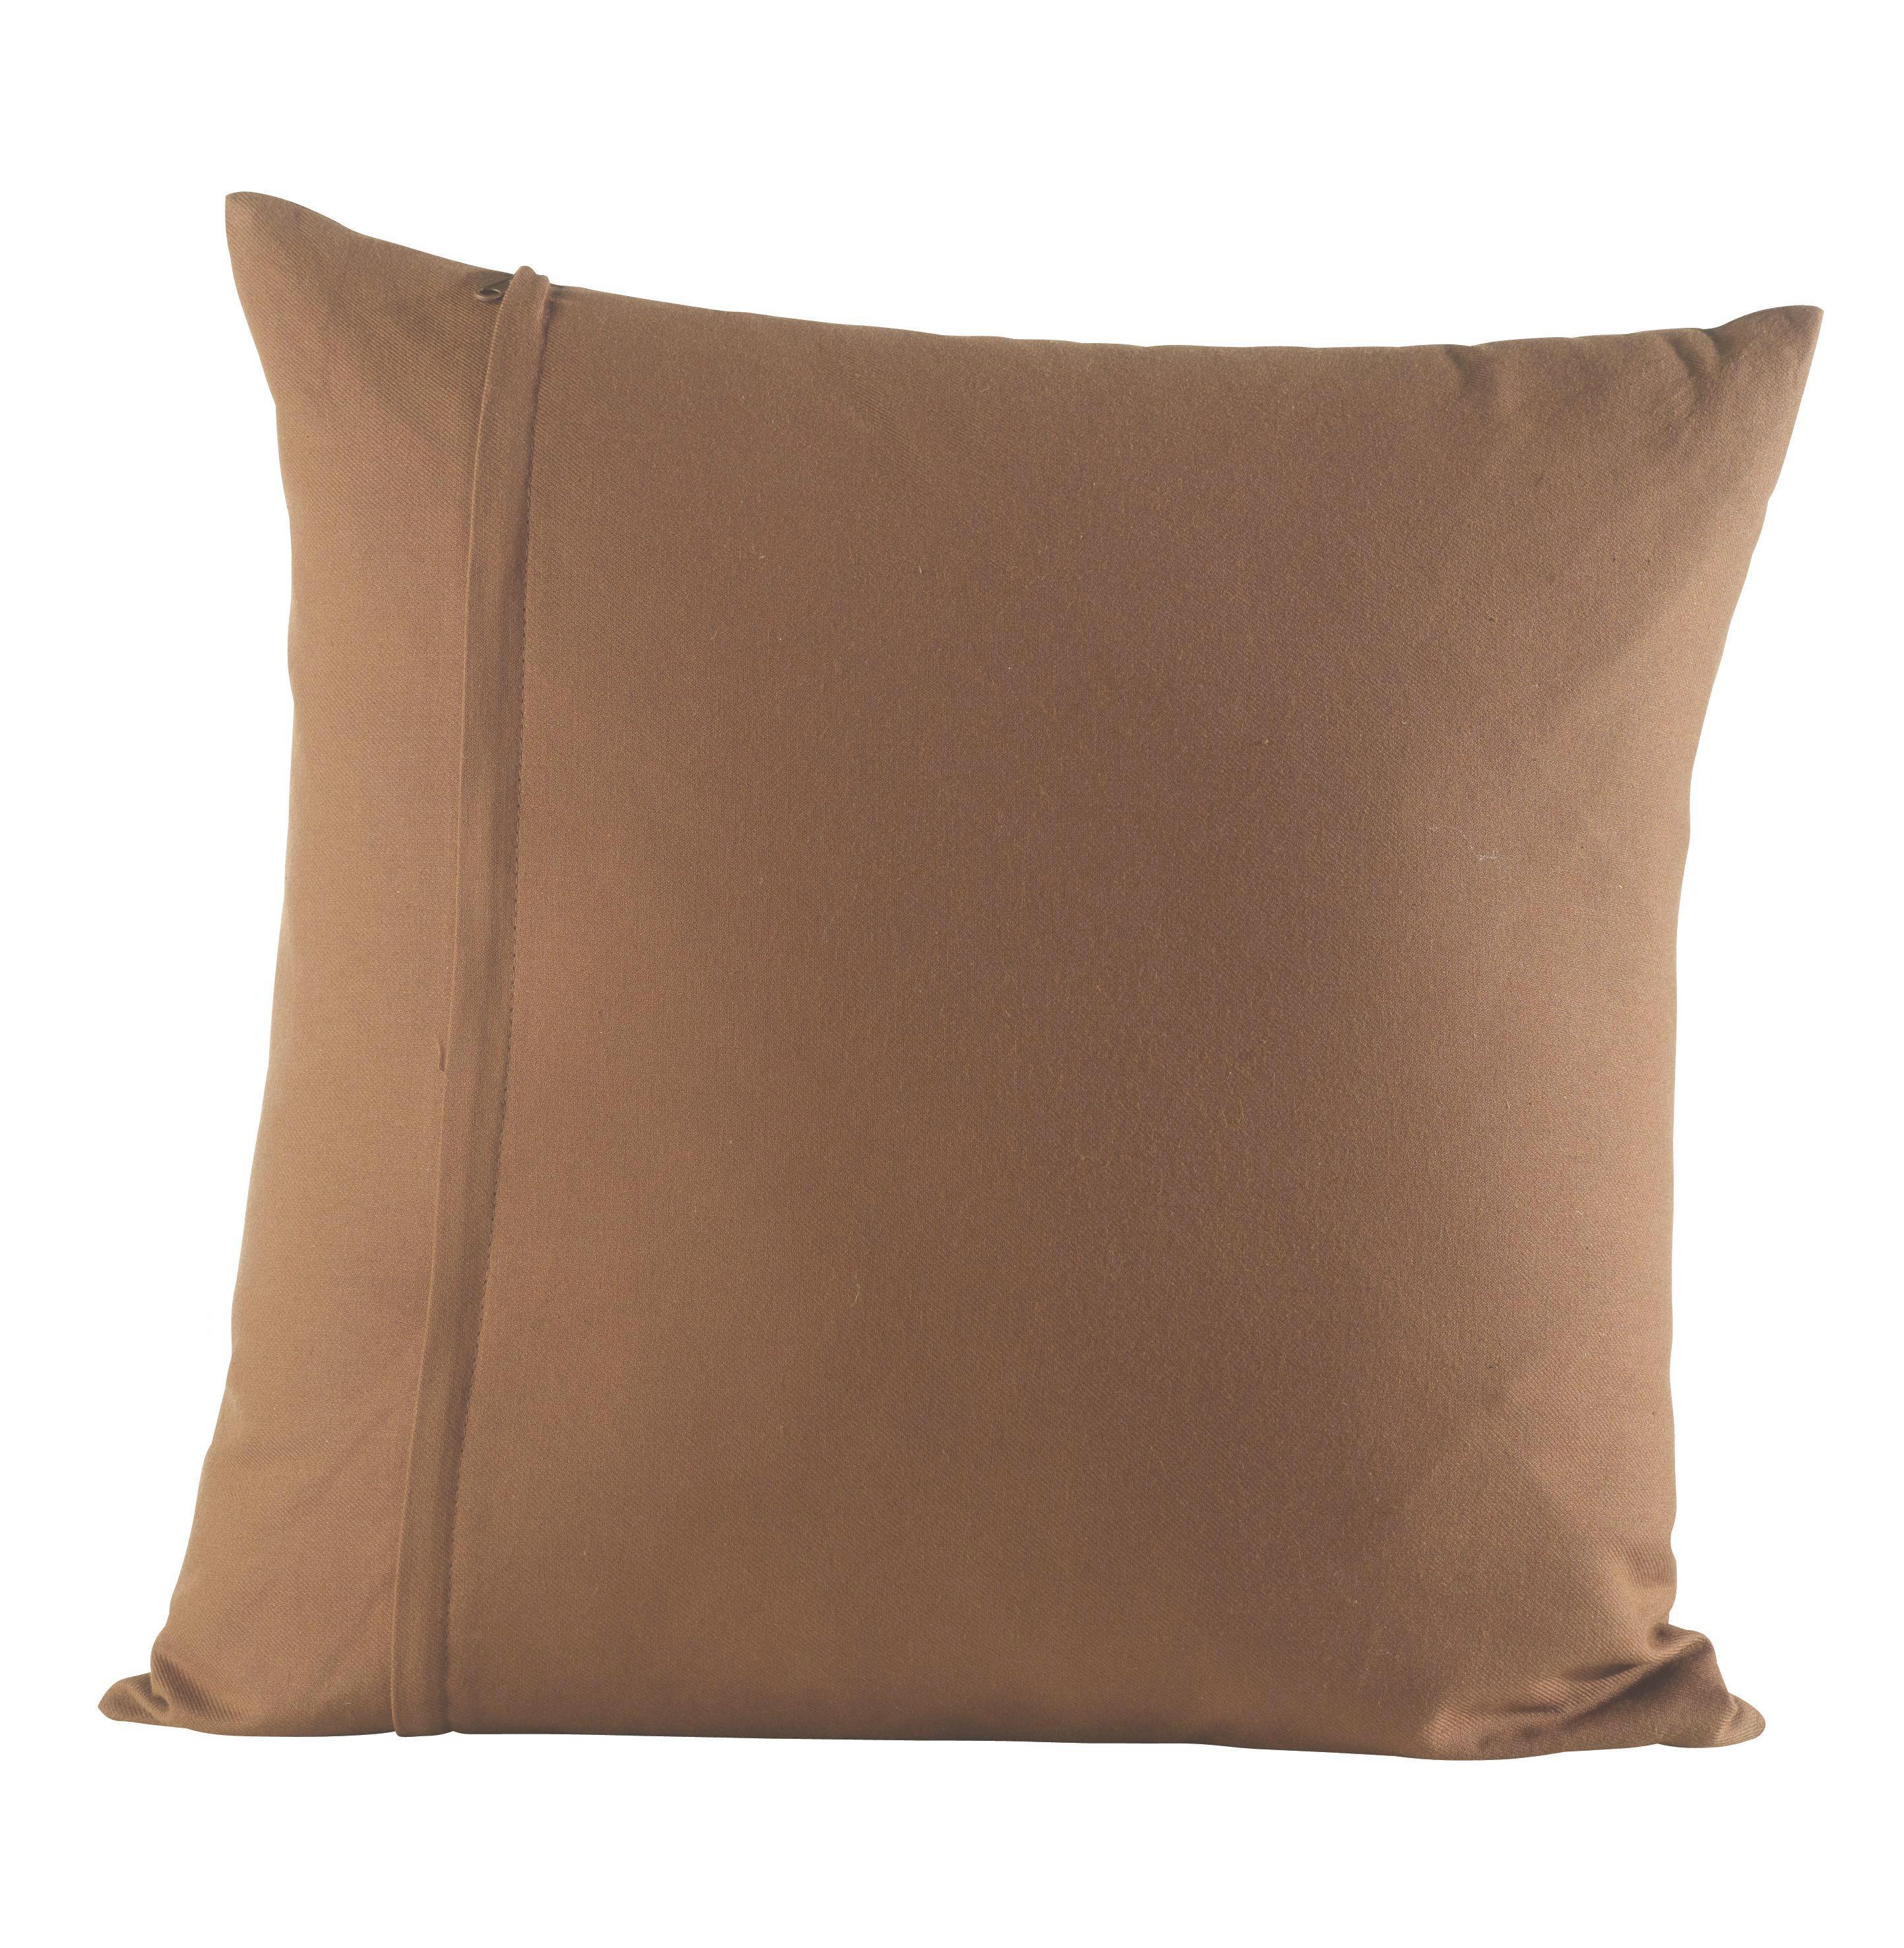 Polštář Ozdobný Zippmex -based-top- - hnědá, textil (50/50cm) - BASED